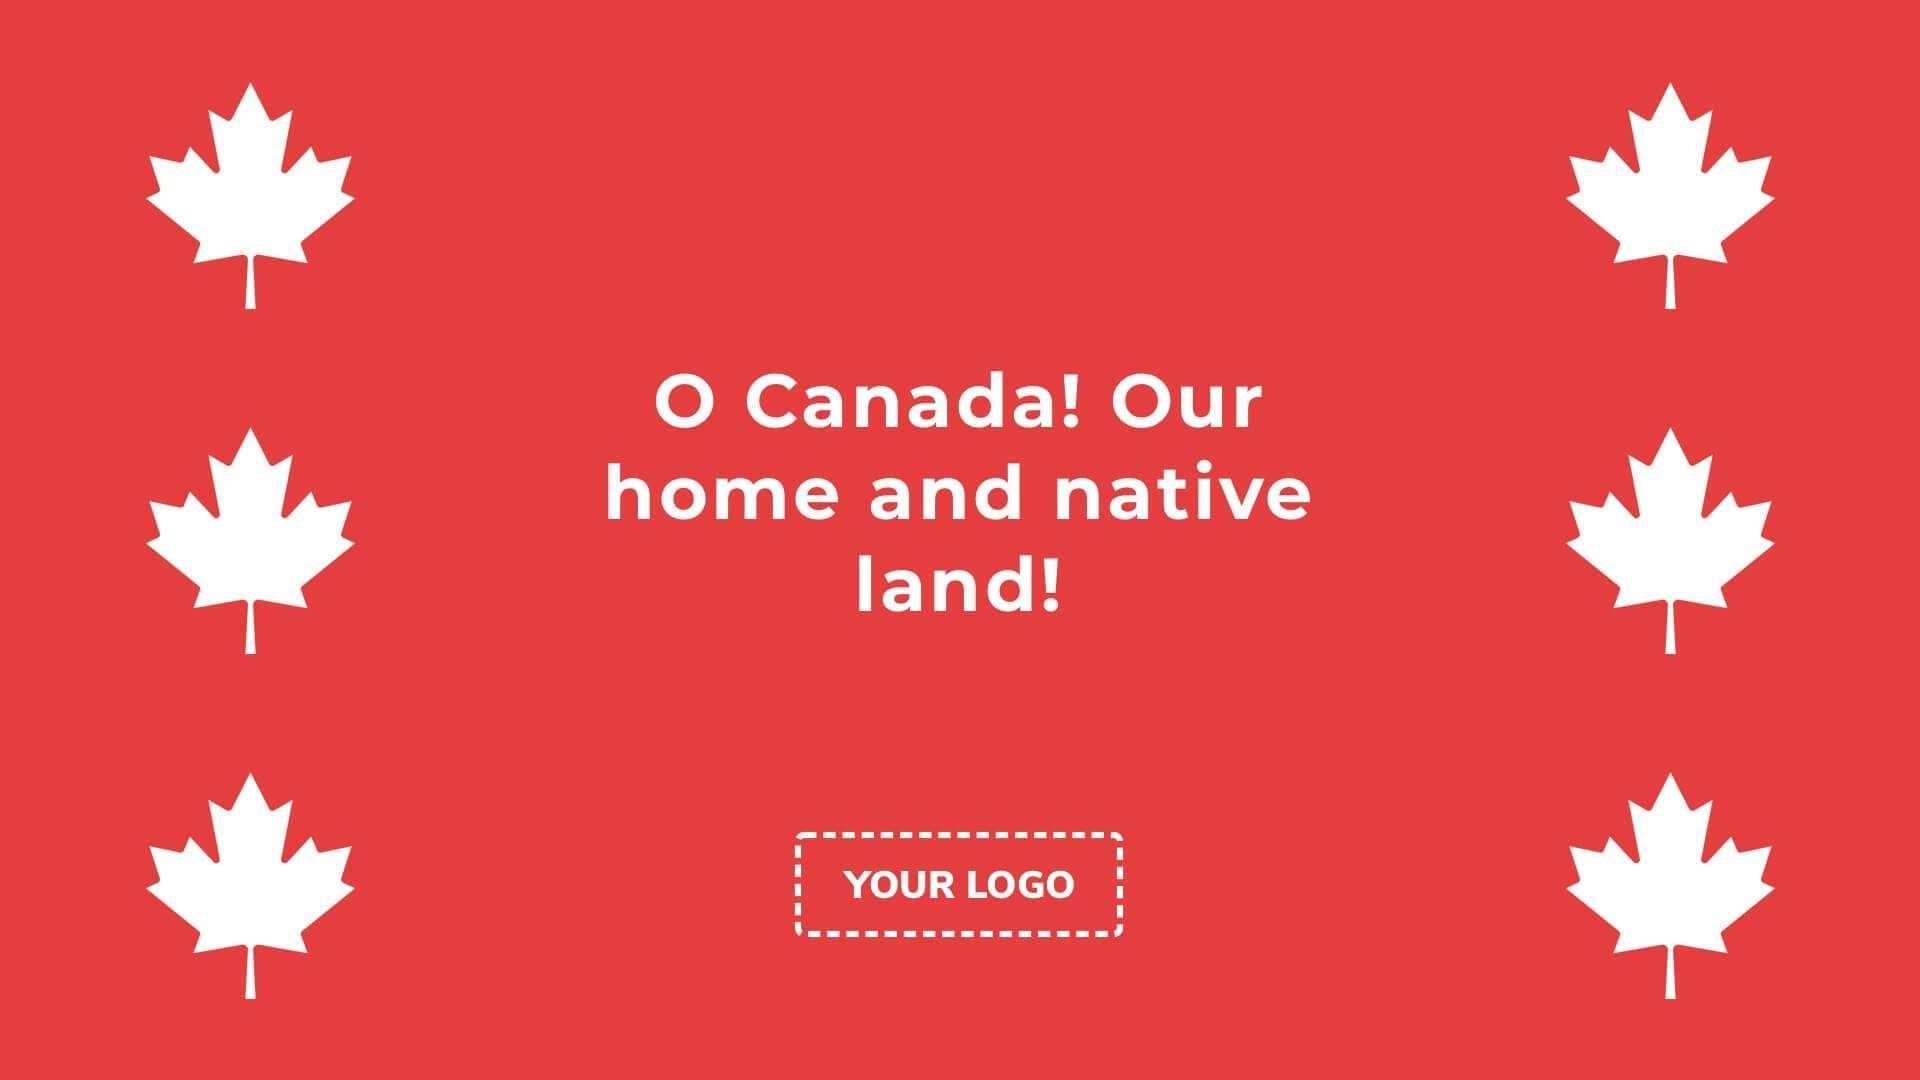 Canadian National Anthem Digital Signage Template